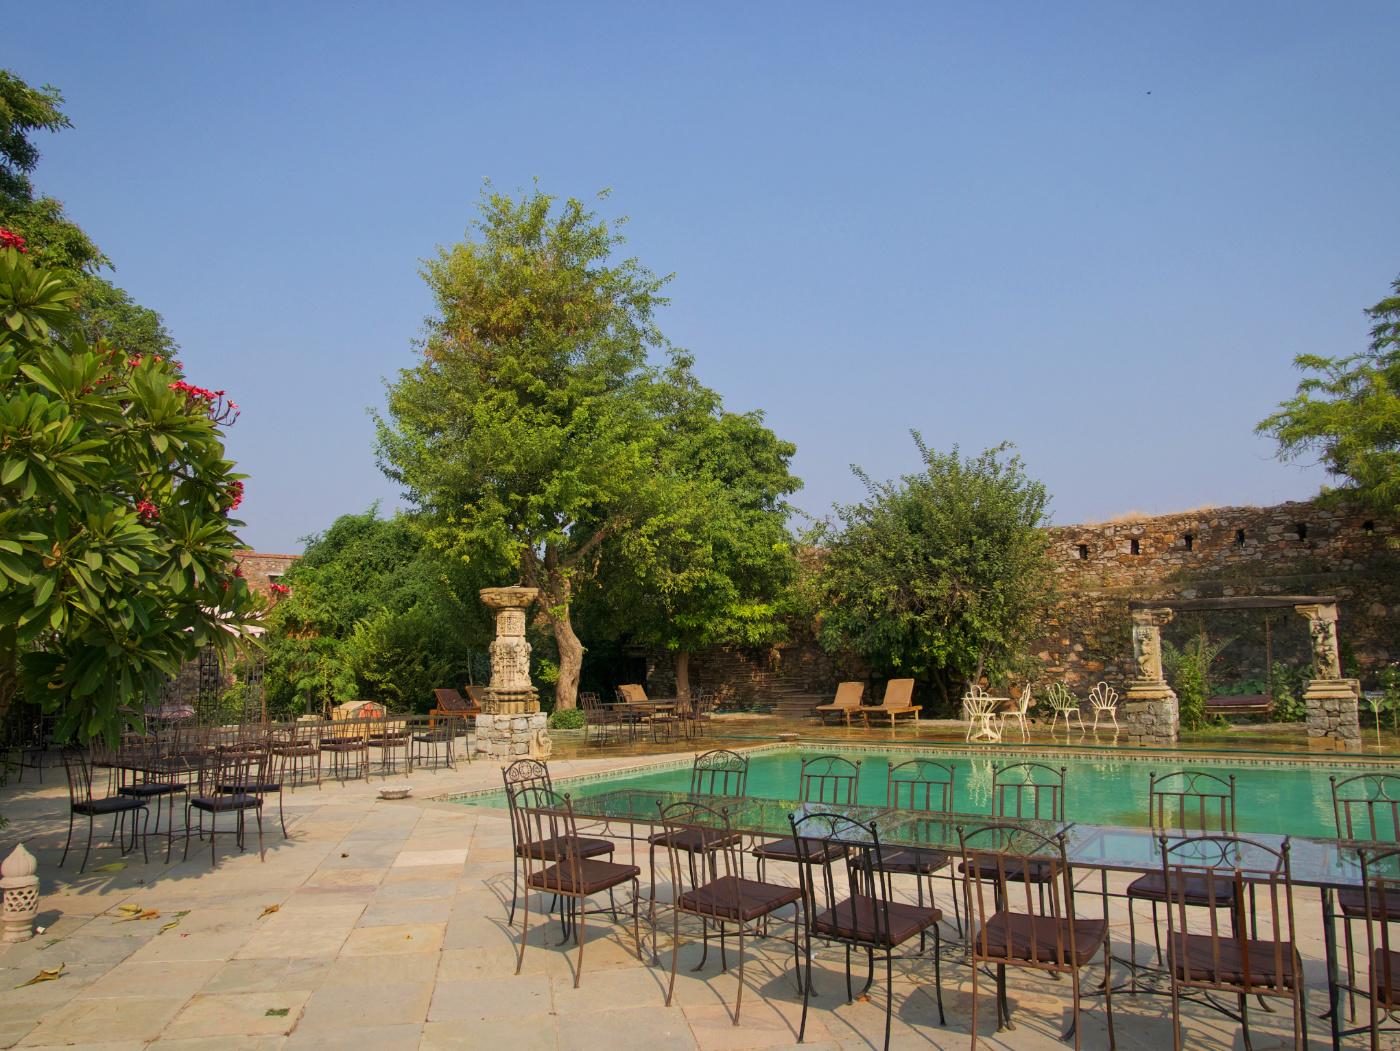 729-India-Bijaipur